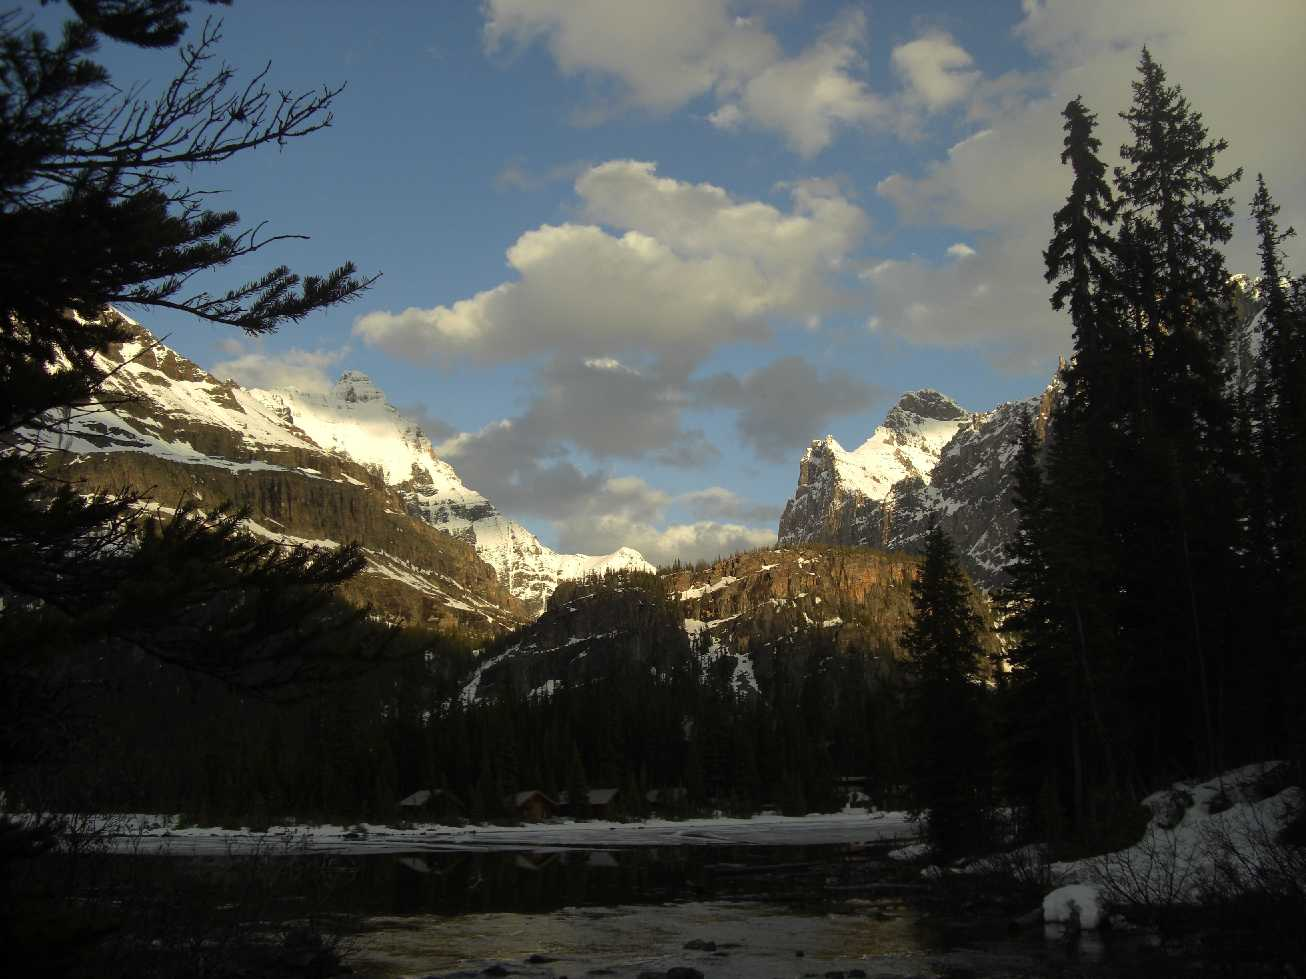 Reisebericht: Kanada. Juni. Camping. Adventure. Schnee. Regen. Kalt.